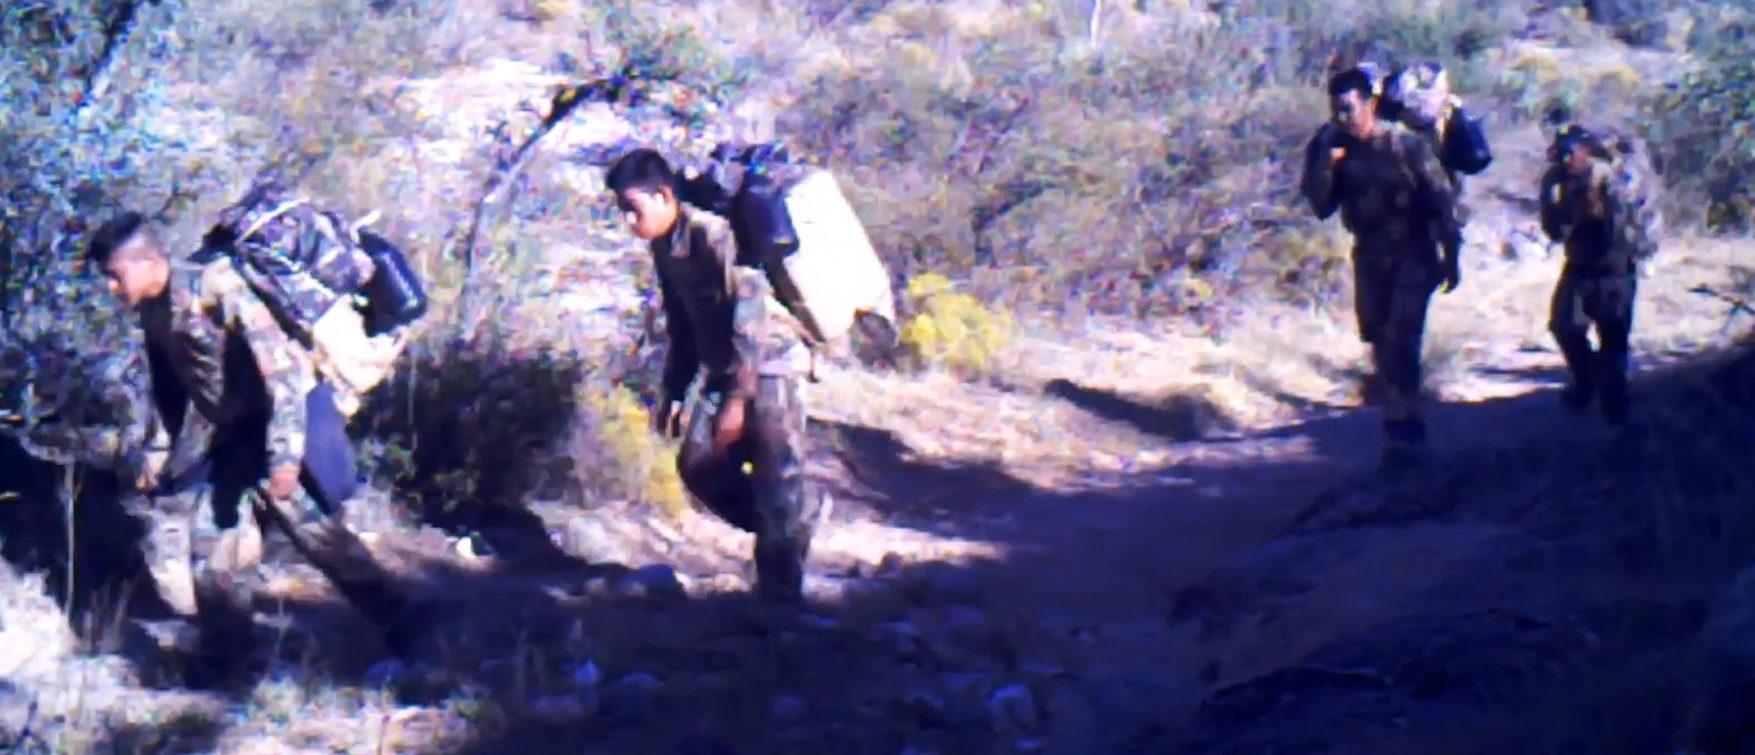 Surveillance video shows Mexican smugglers crossing through an Arizona ranch. Screenshot via YouTube/TheDC Shorts